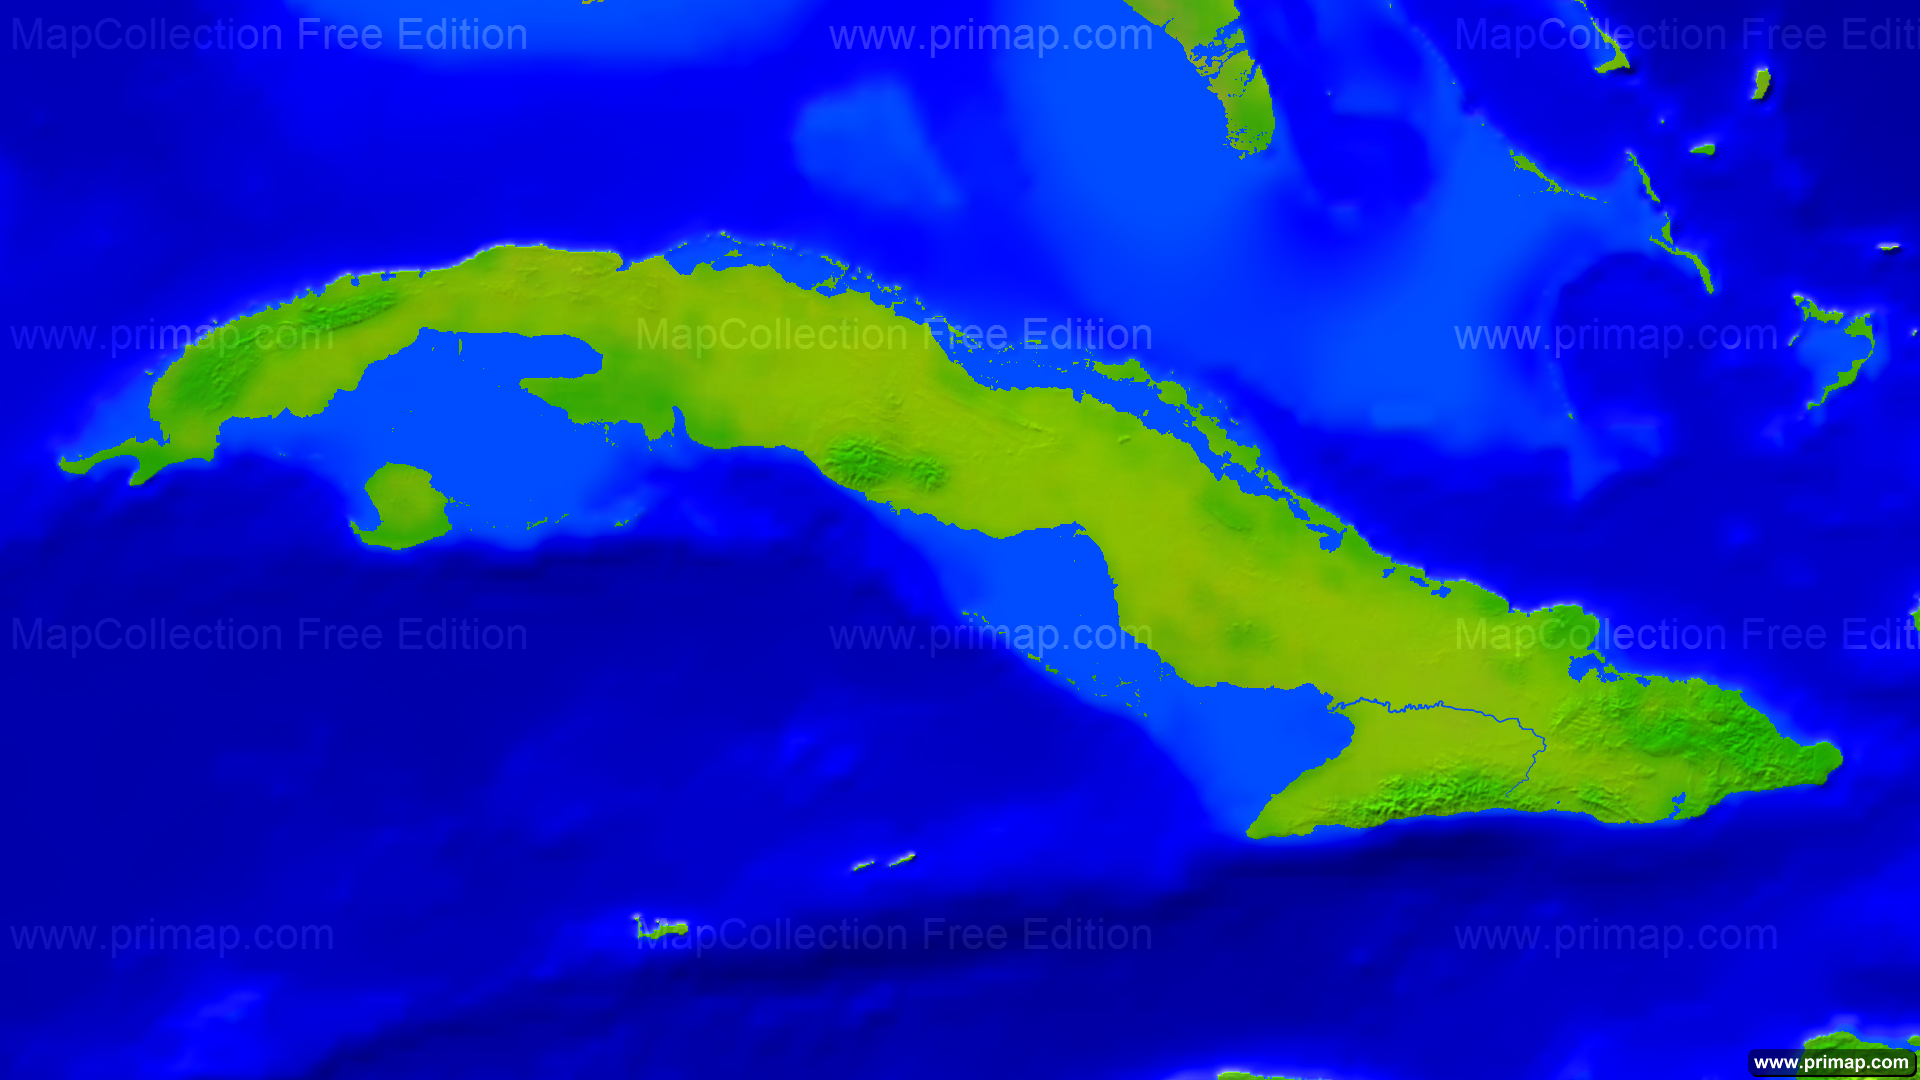 Primap national maps cuba vegetation 1920x1080 show map gumiabroncs Image collections